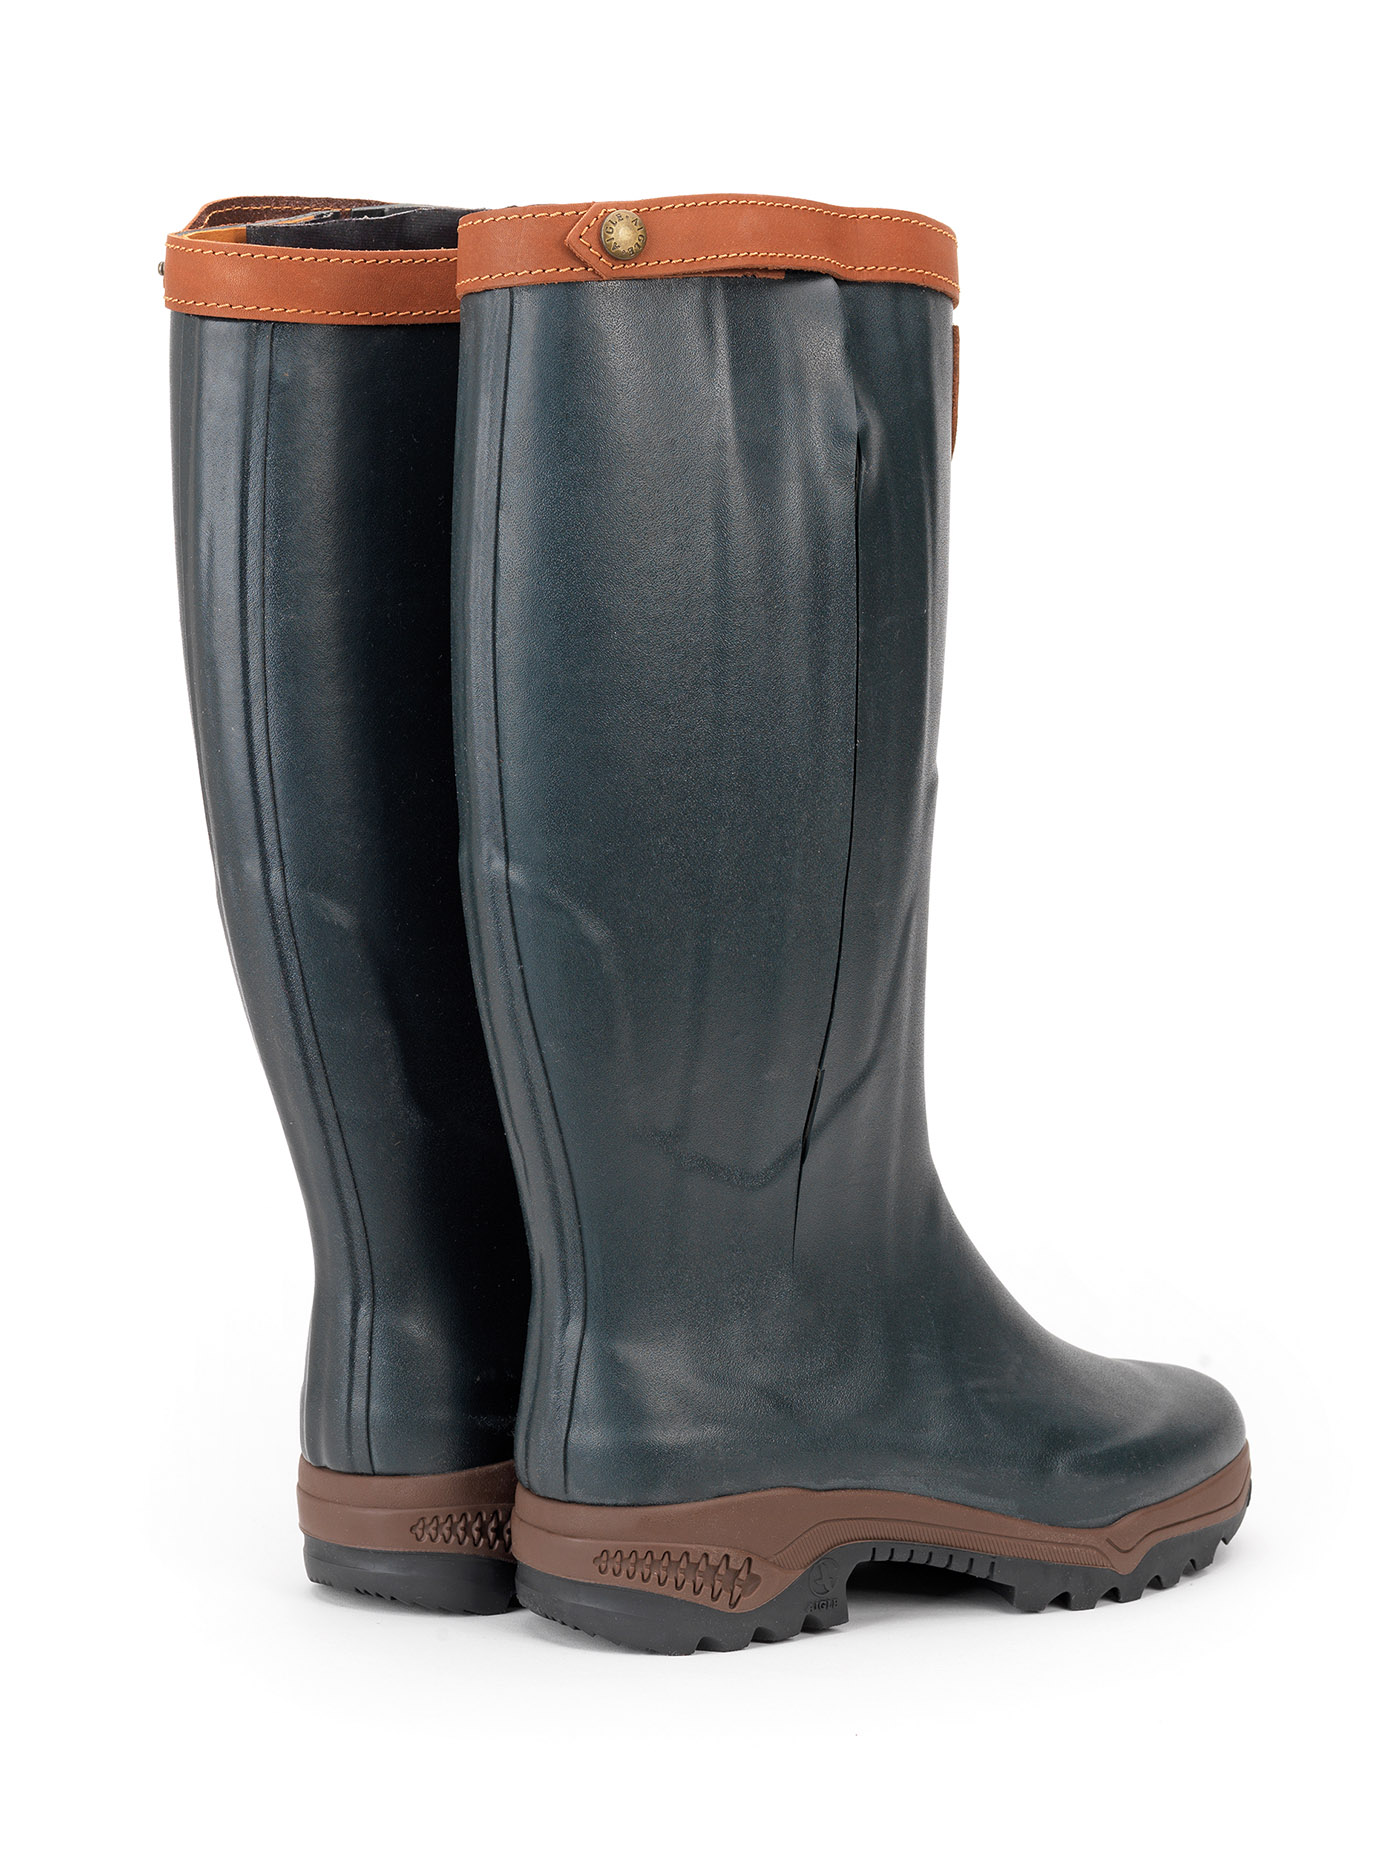 aigle parcours iso open wellingtons boots